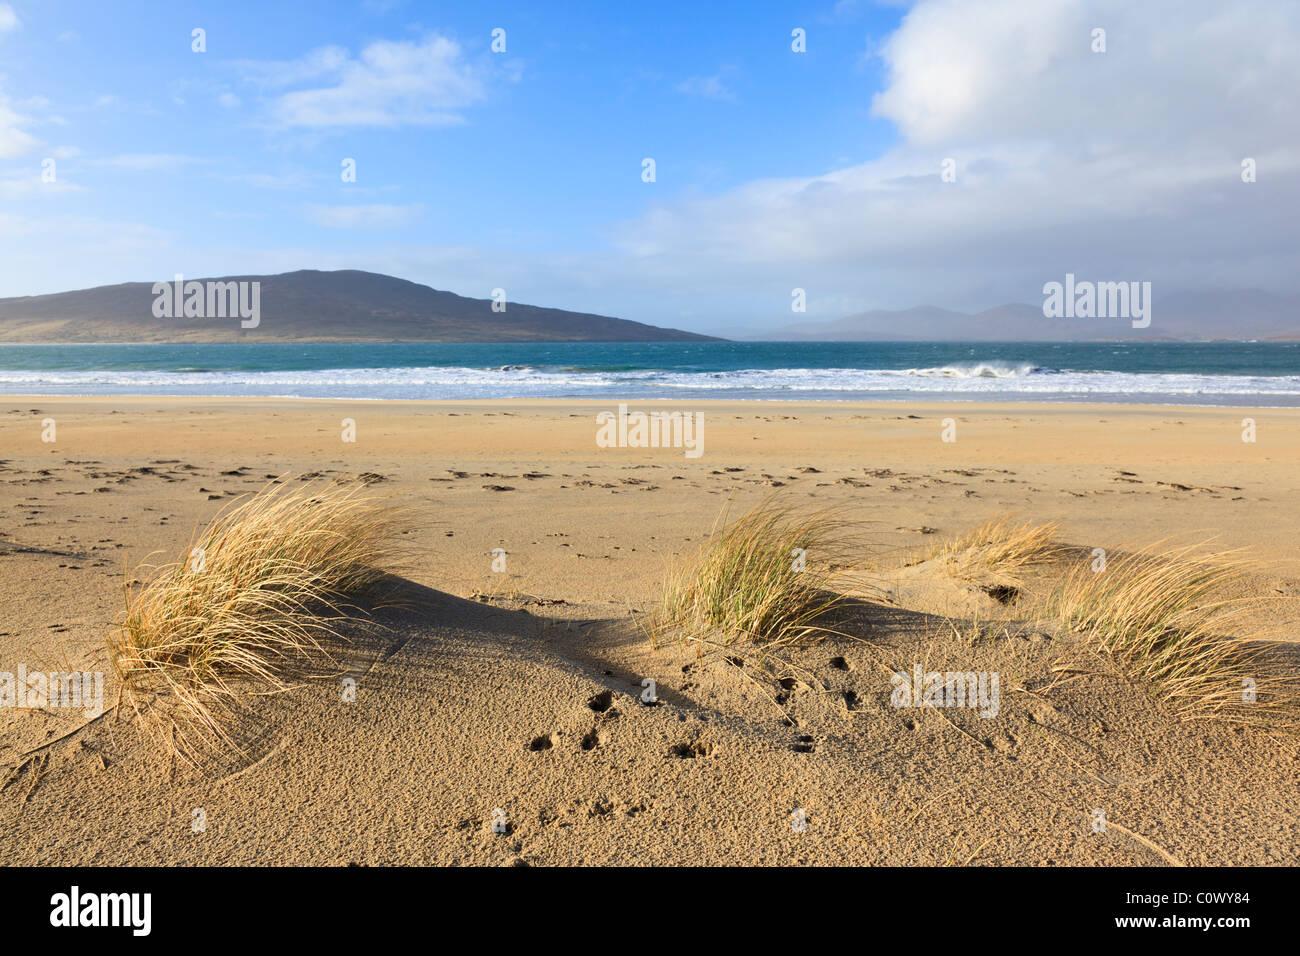 The isle of Taransay seen from Luskentyre beach - Stock Image